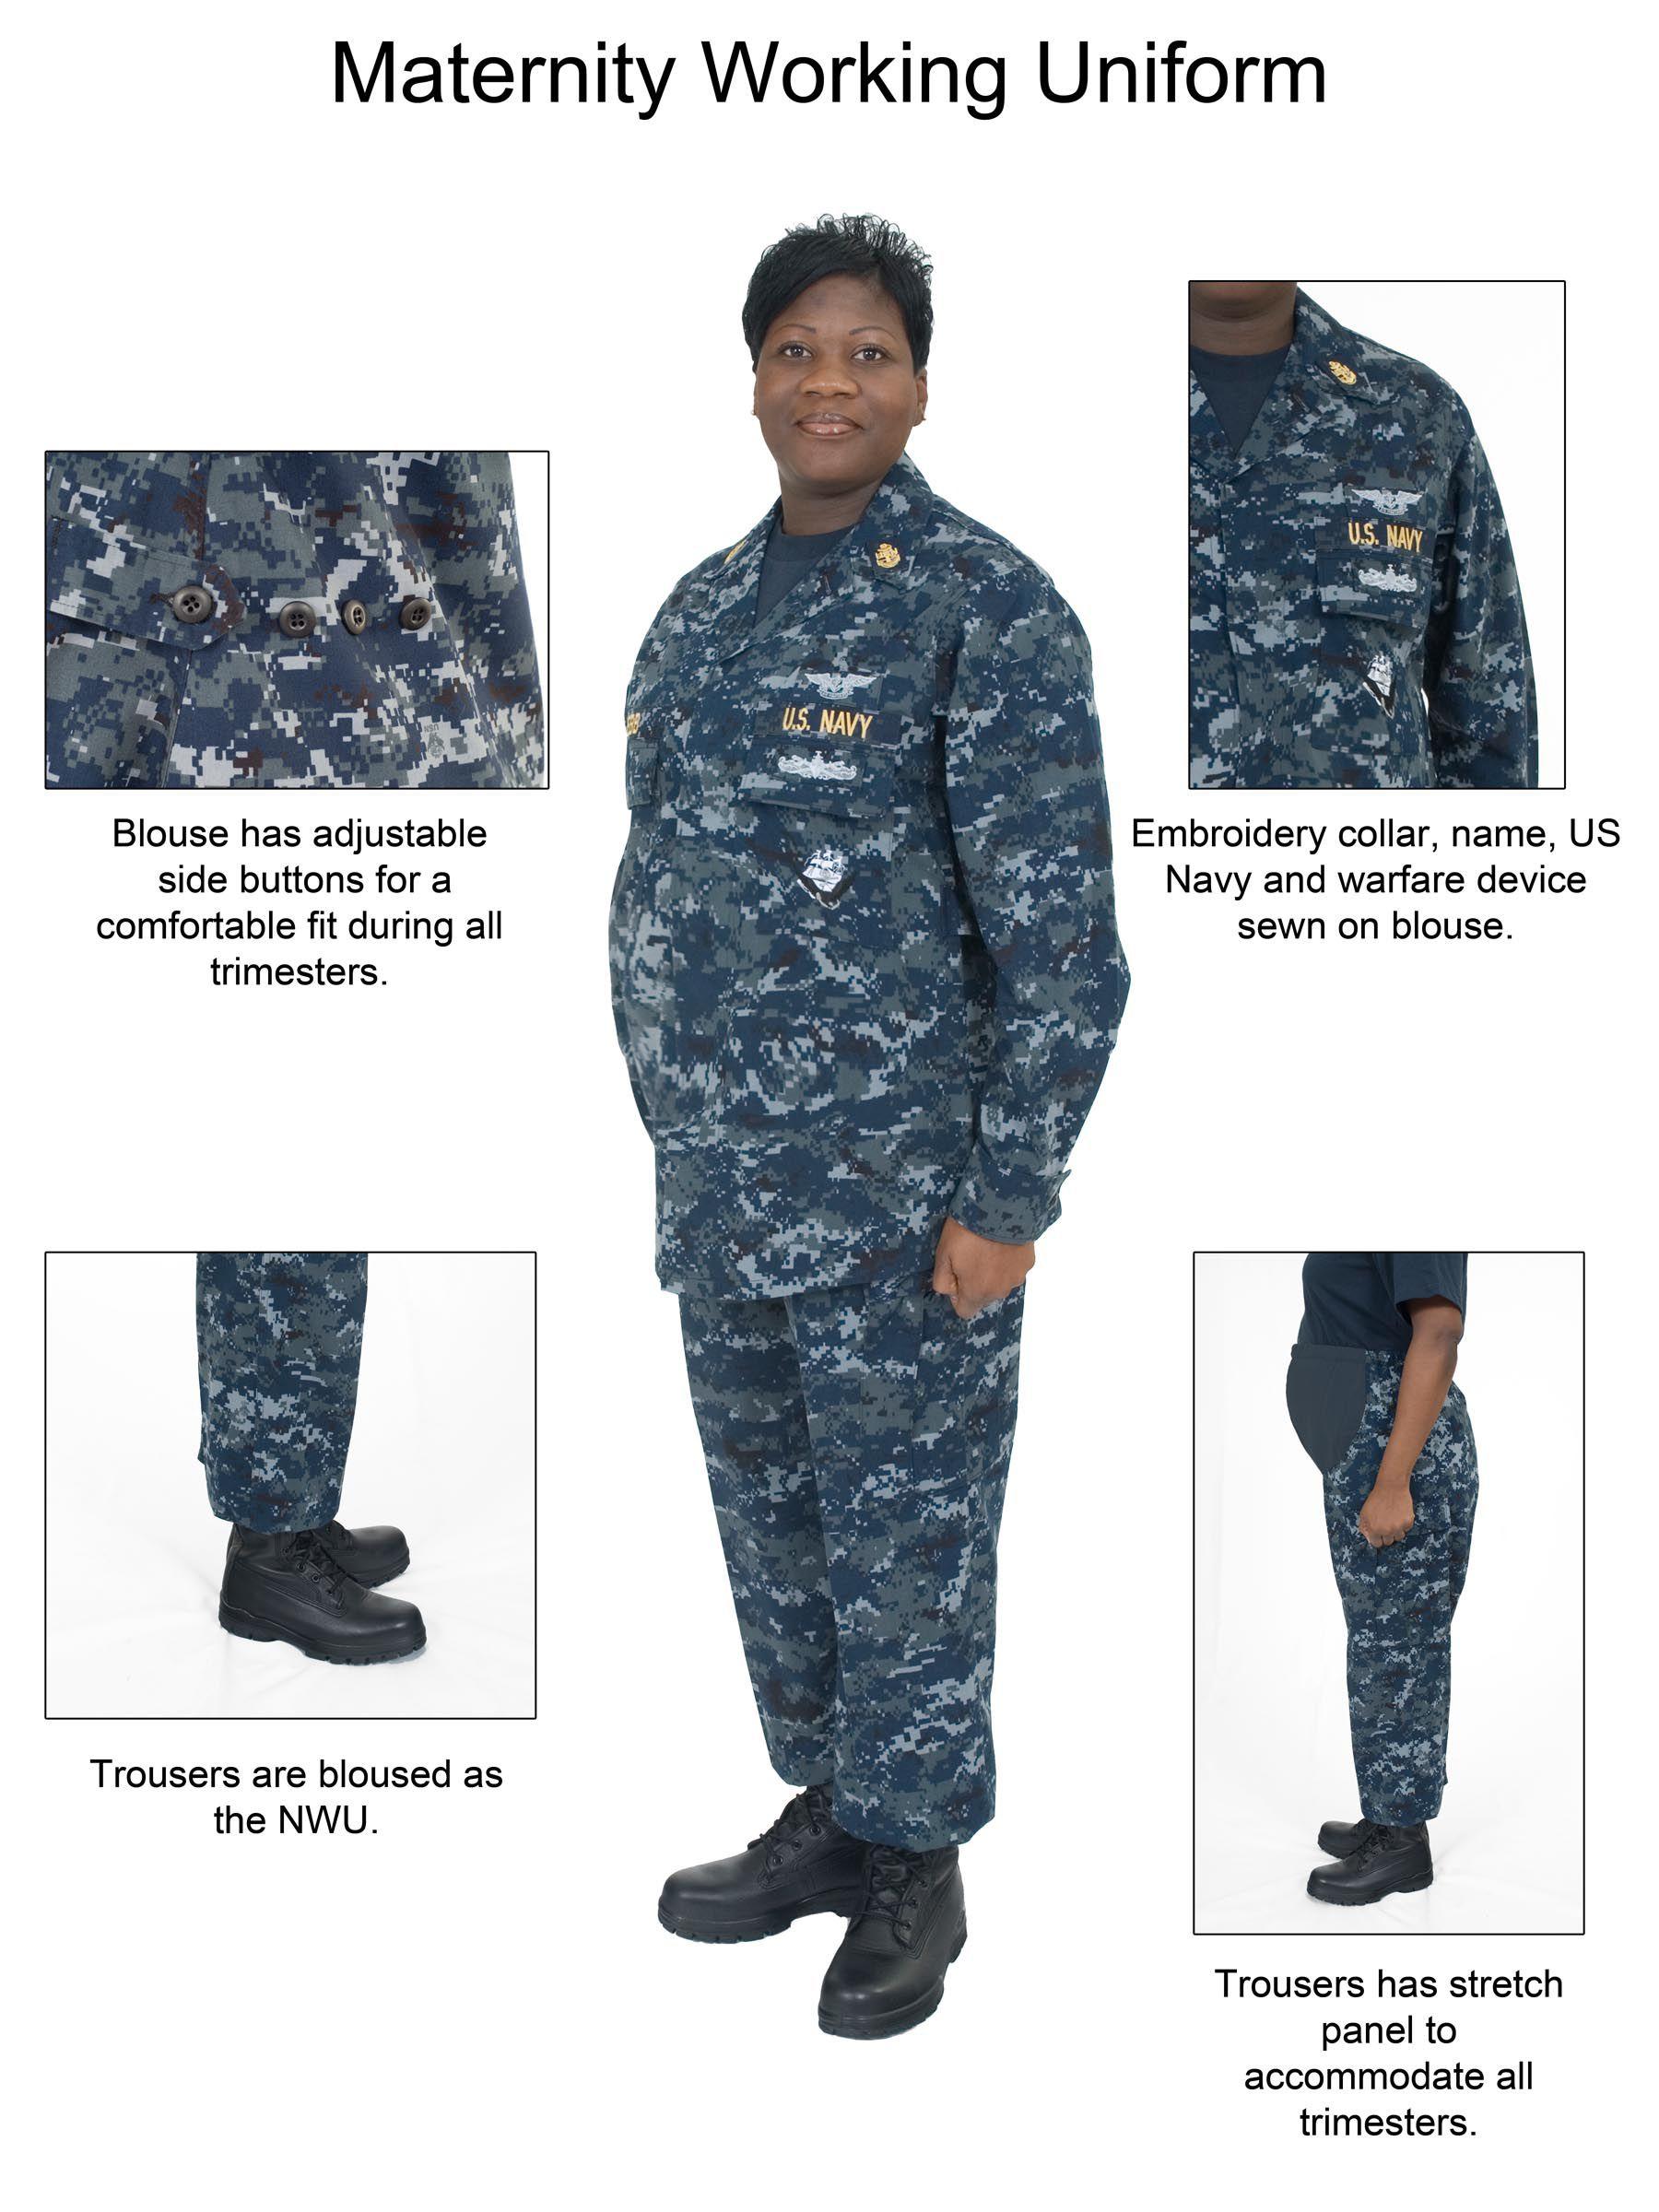 46bdcadadb51c Current-issue USN maternity working uniform... Navy Uniforms, United States  Navy